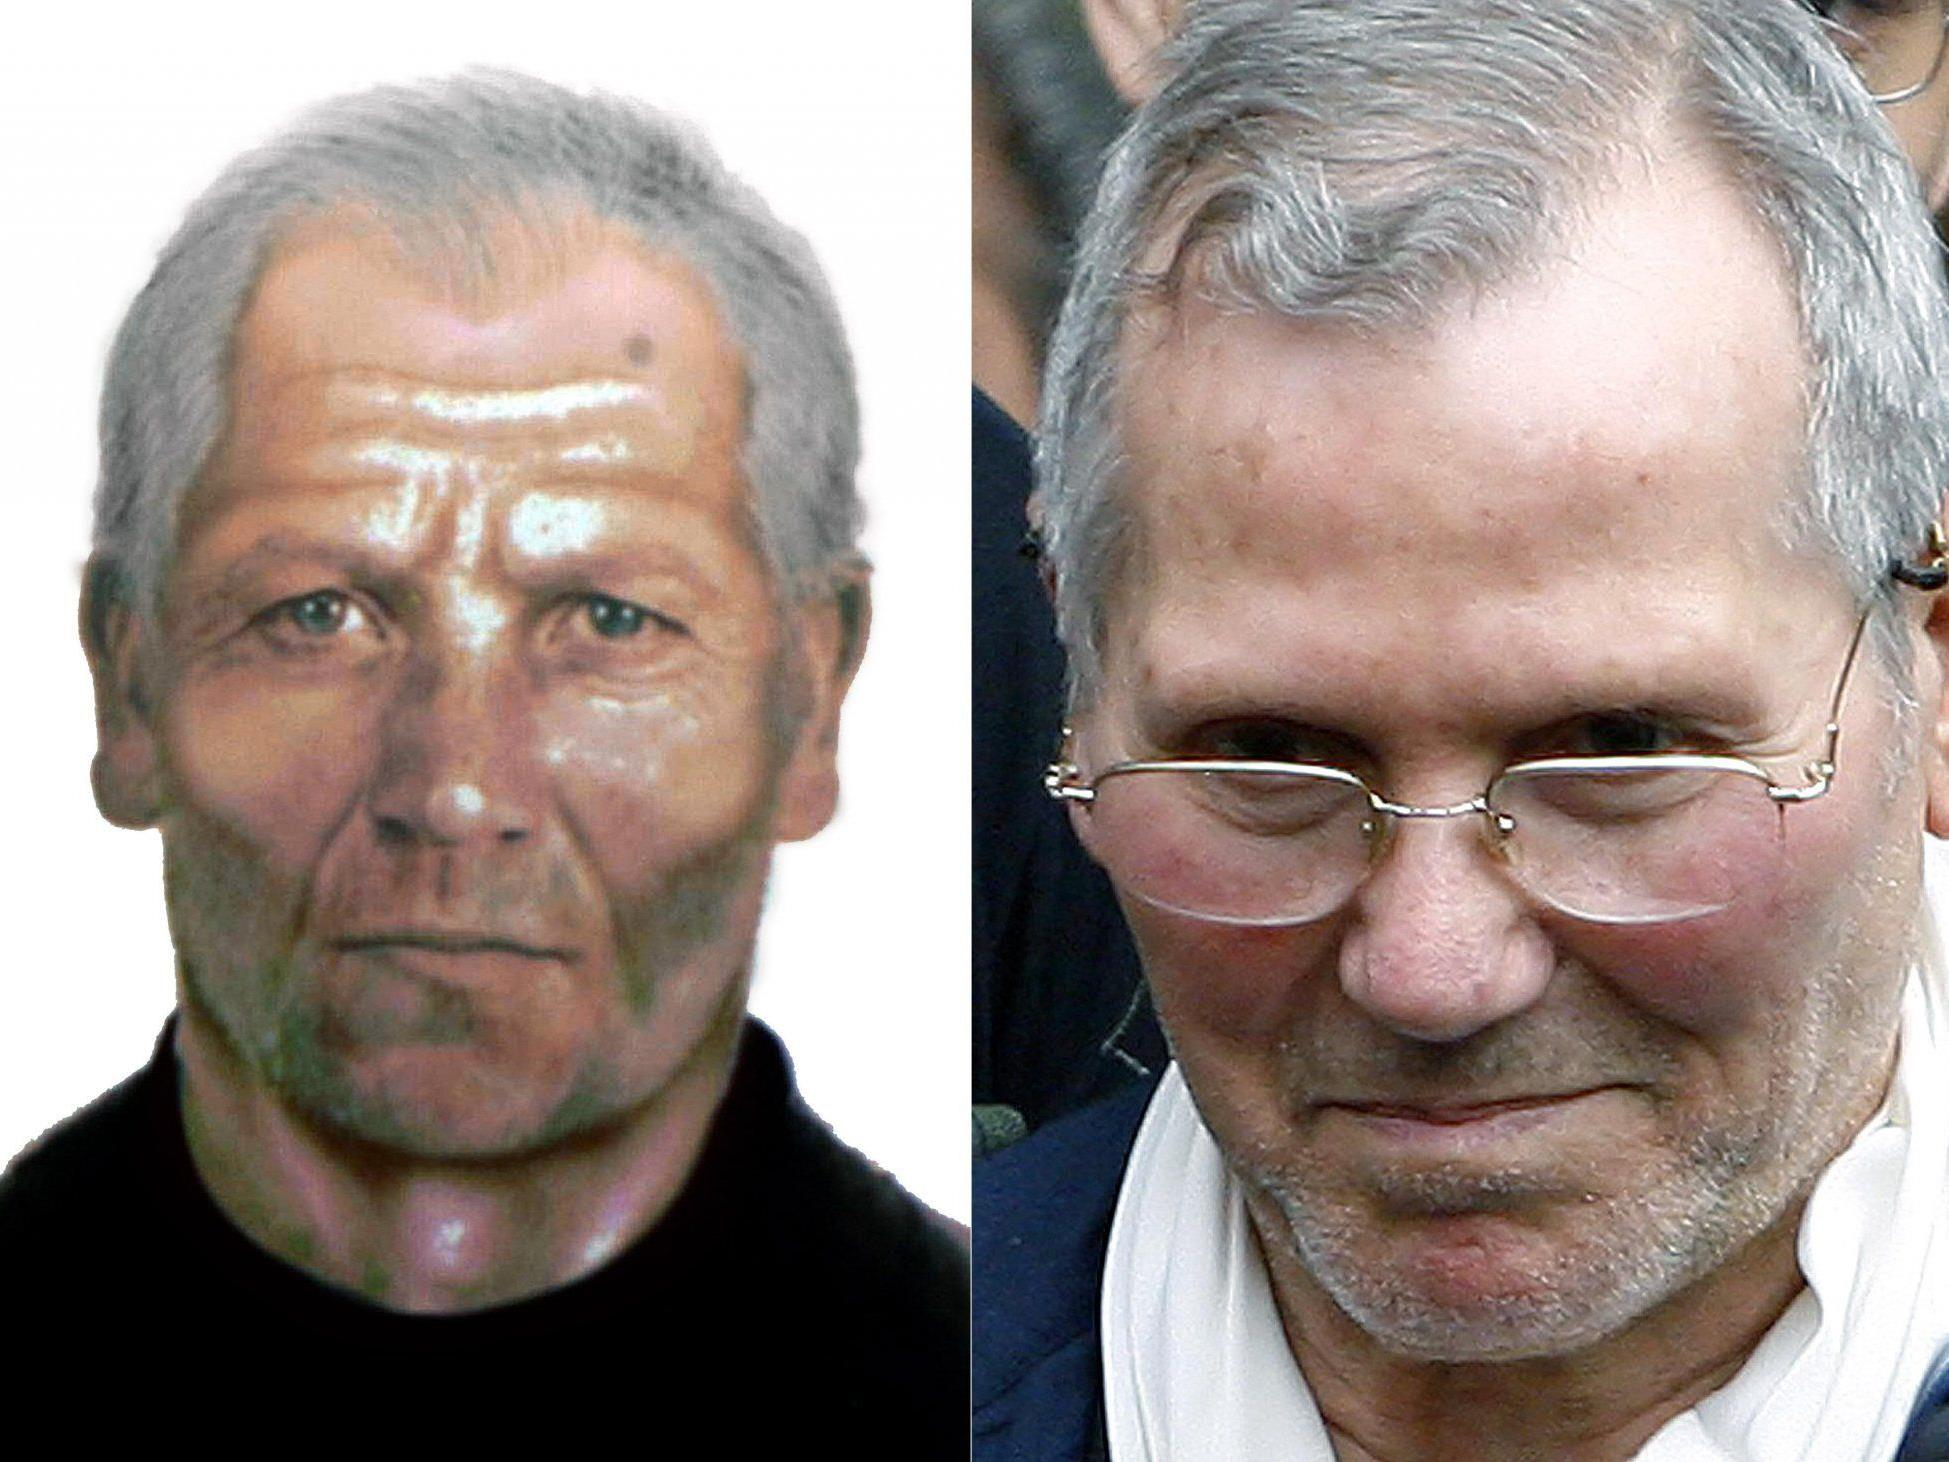 Der Boss der Bosse der Mafia Bernardo Provenzano